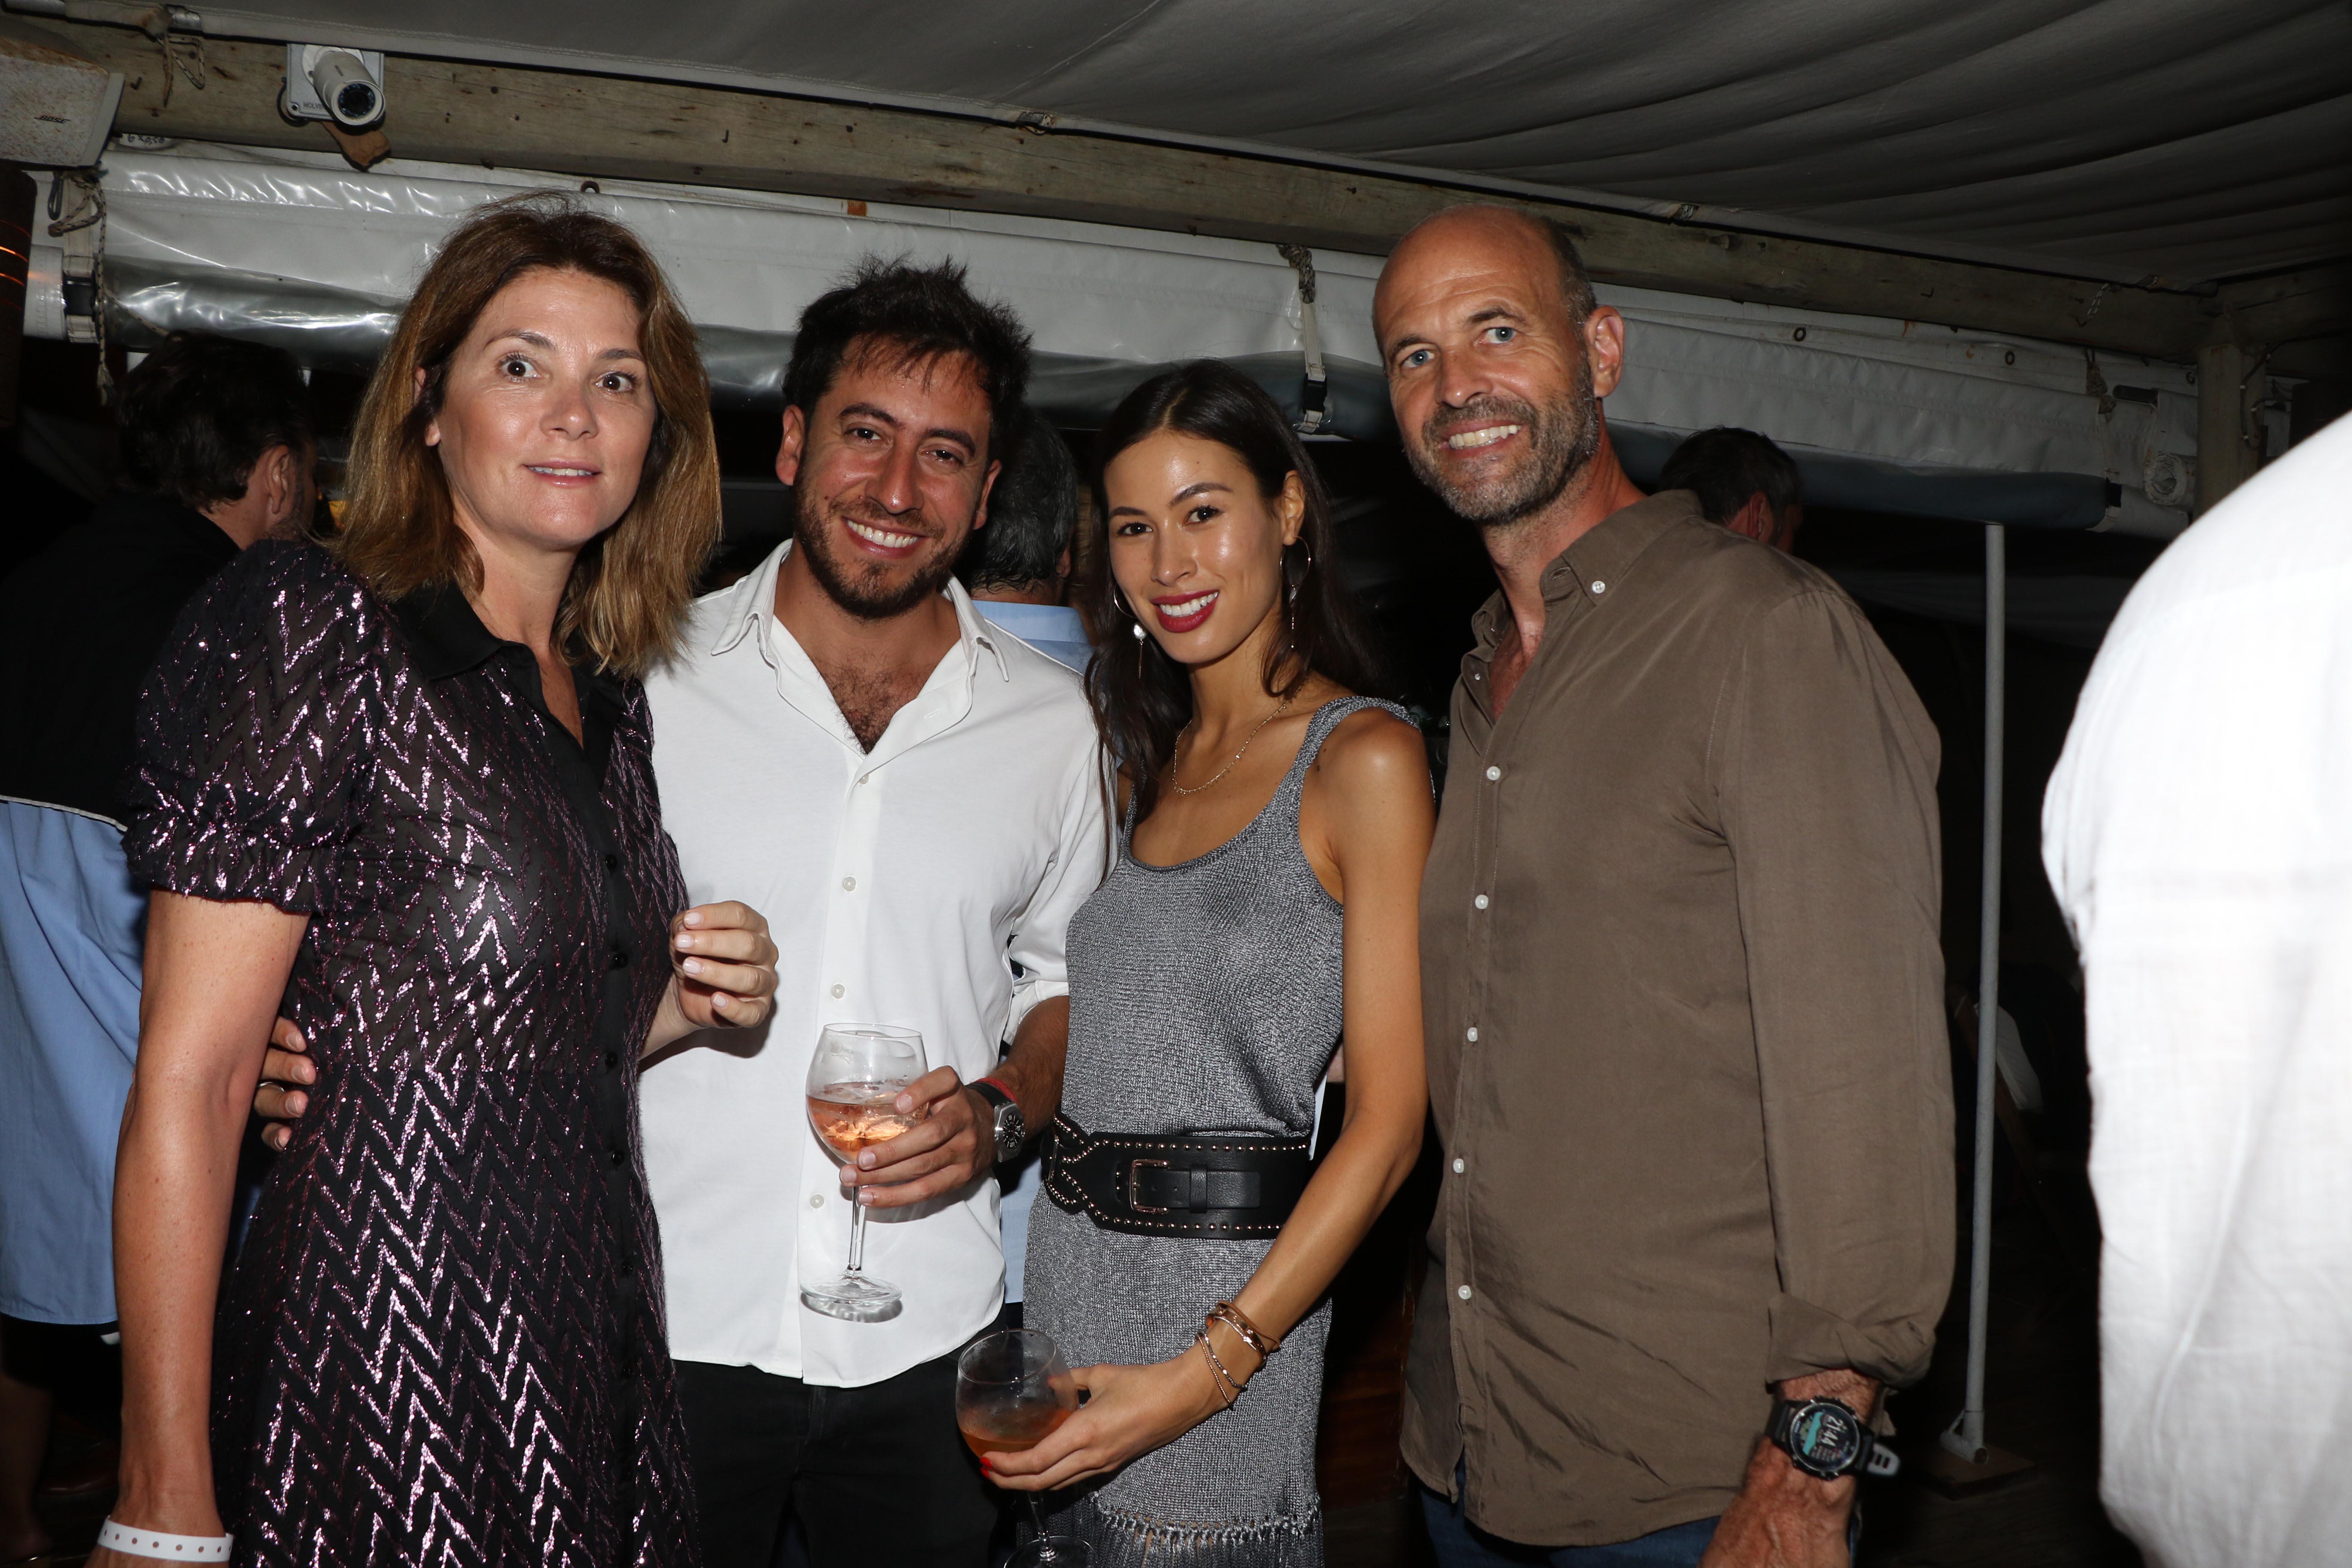 Javiera Álvarez Echagüe, Gastón Parisier, Mika Kim y Guillermo Dietrich